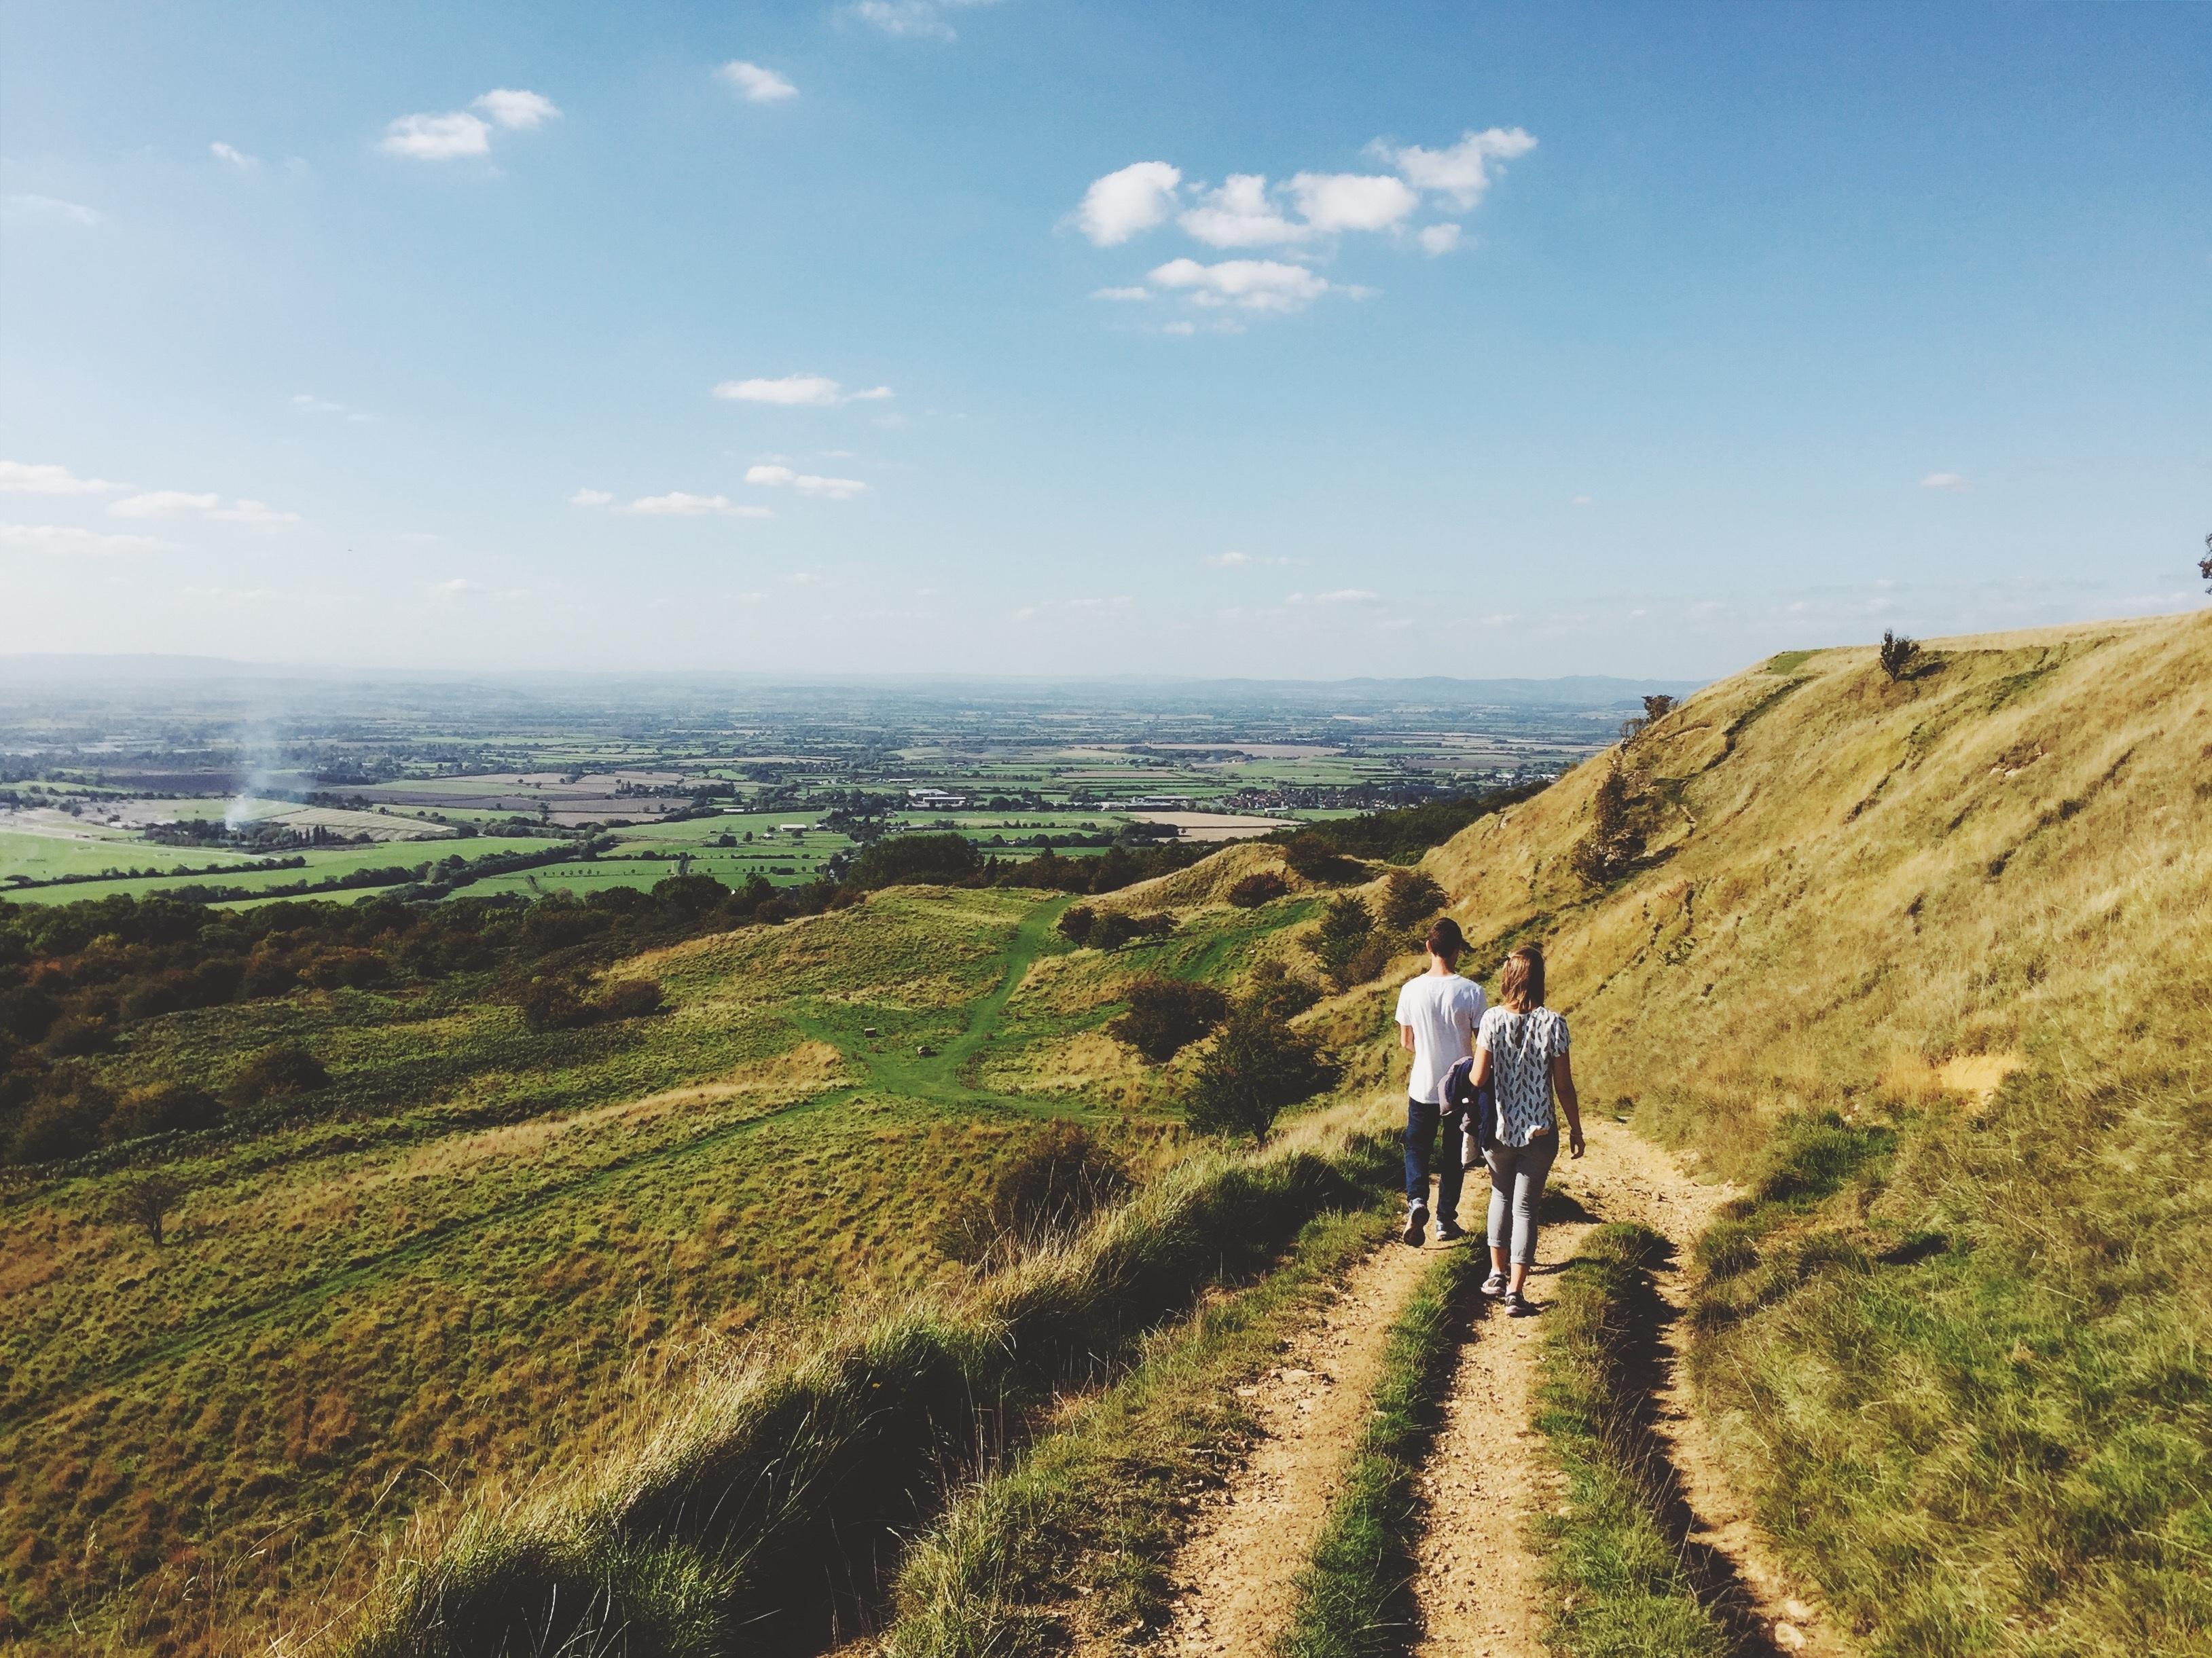 man-landscape-coast-nature-path-grass-680857-pxhere.com